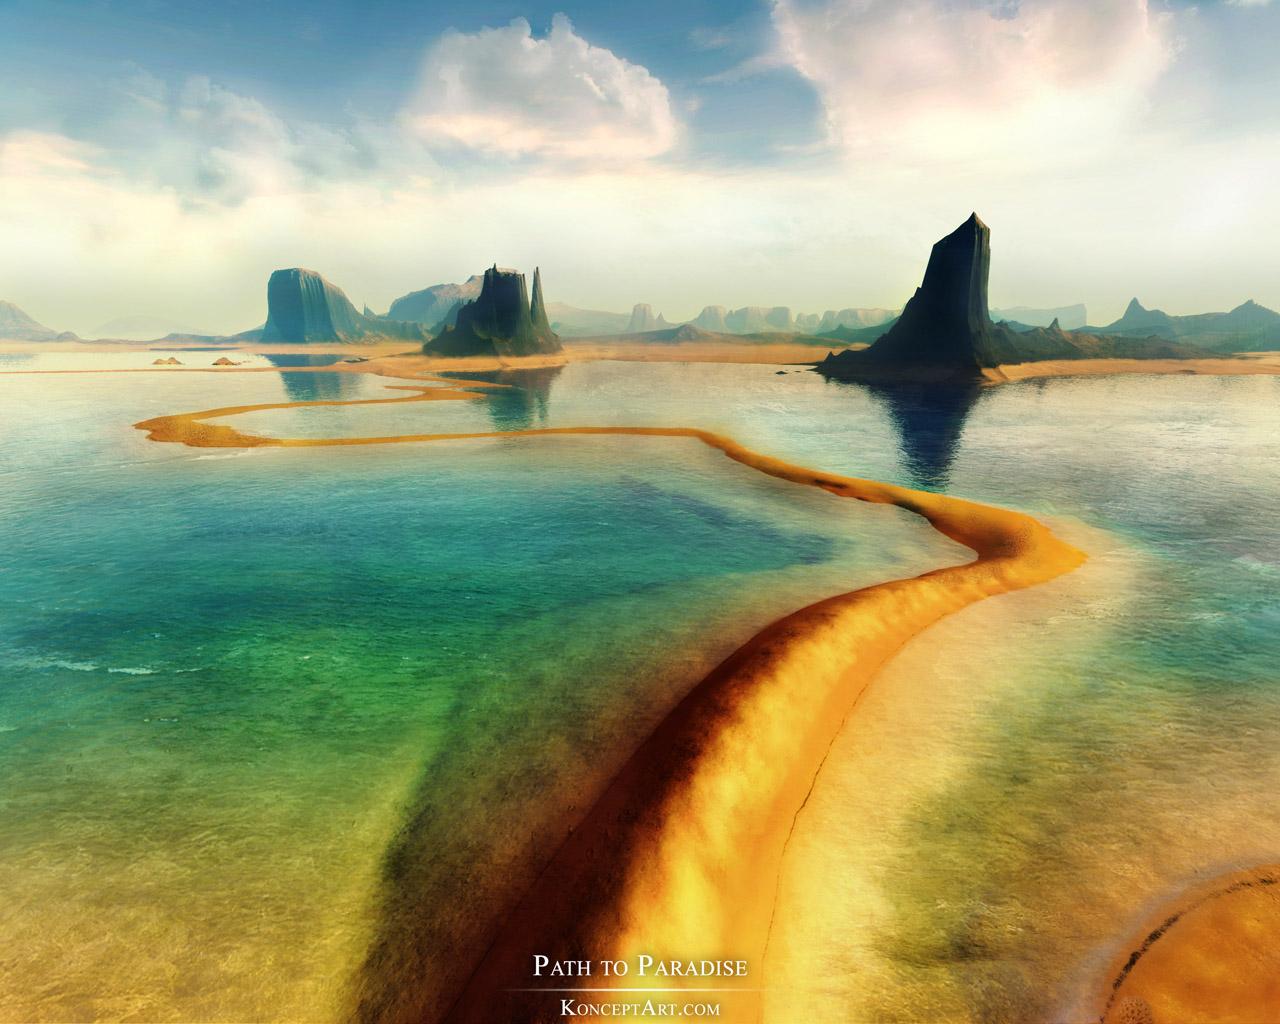 http://3.bp.blogspot.com/_HzAThb2RgMc/TLxhJx0JeOI/AAAAAAAABnU/R4fFmJWjnGw/s1600/_Path_to_Paradise__by_adit.jpg